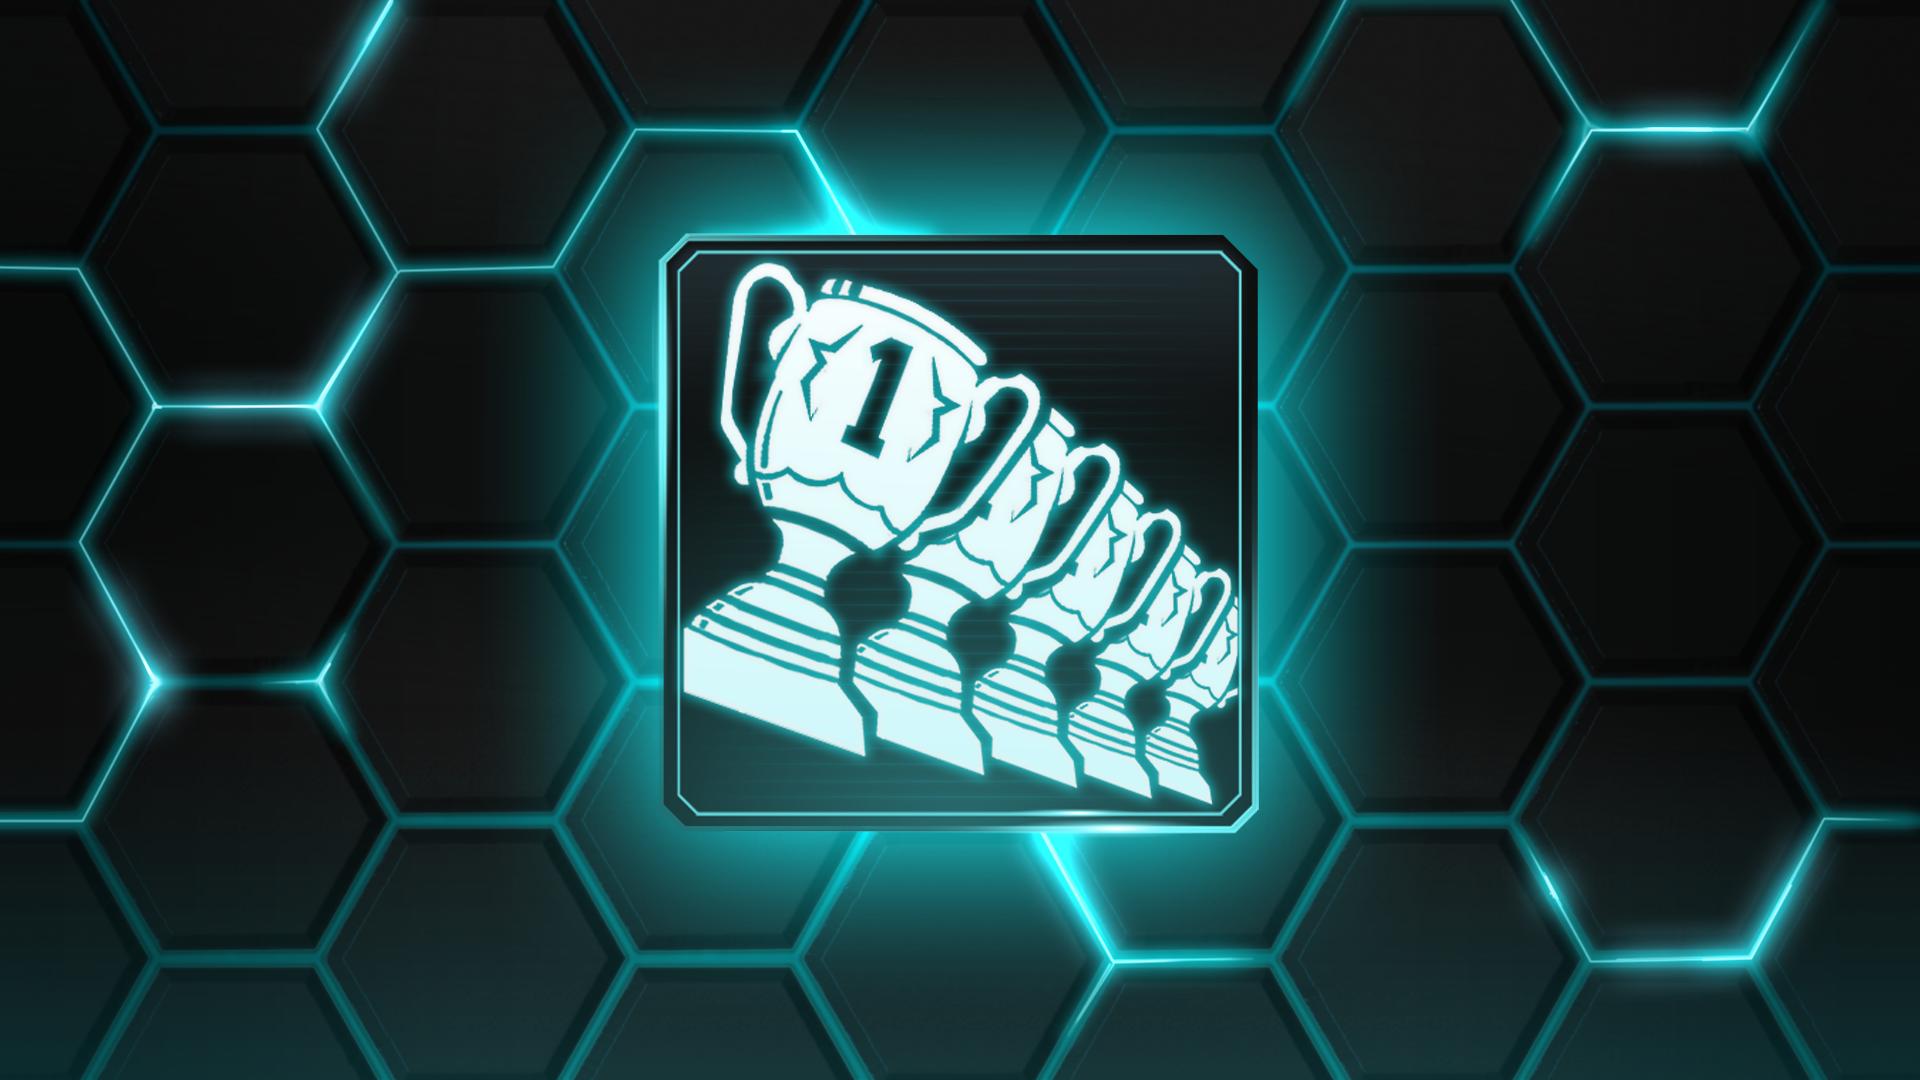 Icon for The Mandatory Option